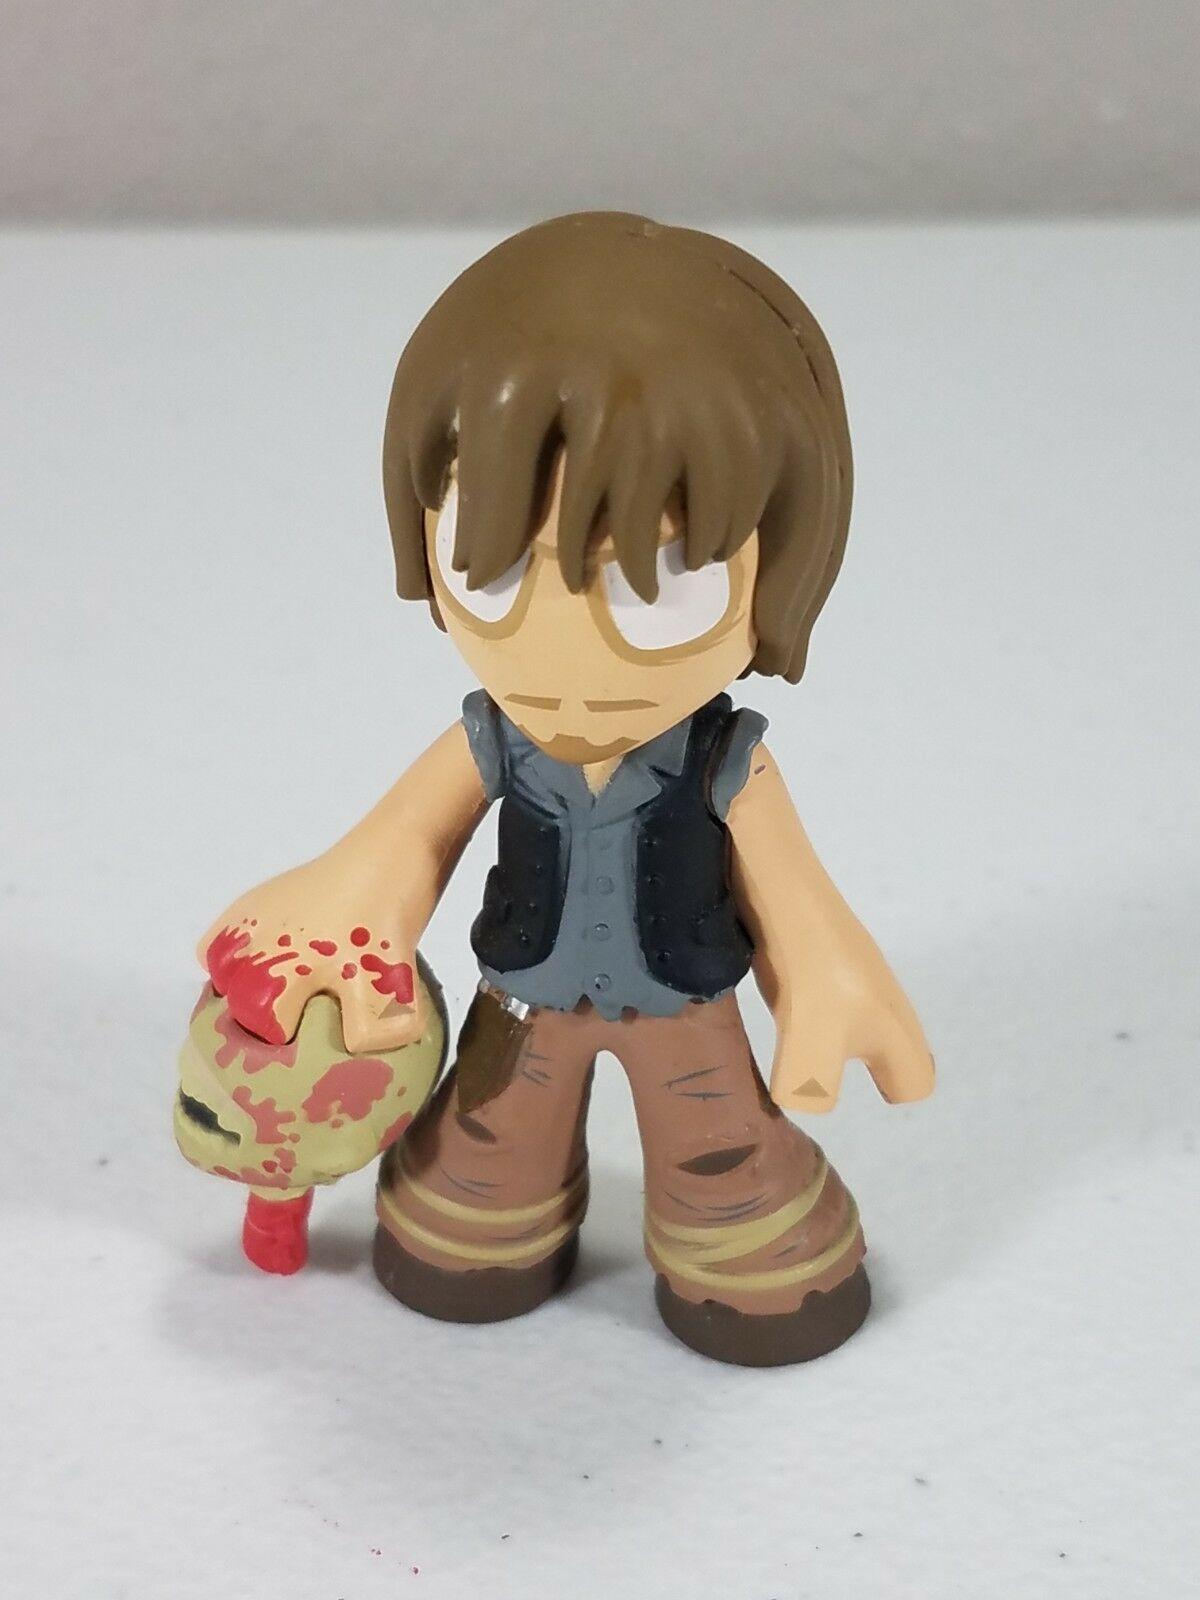 Walking Dead Daryl Dixon with Walker Head Walmart Excl. - Funko Mystery Minis